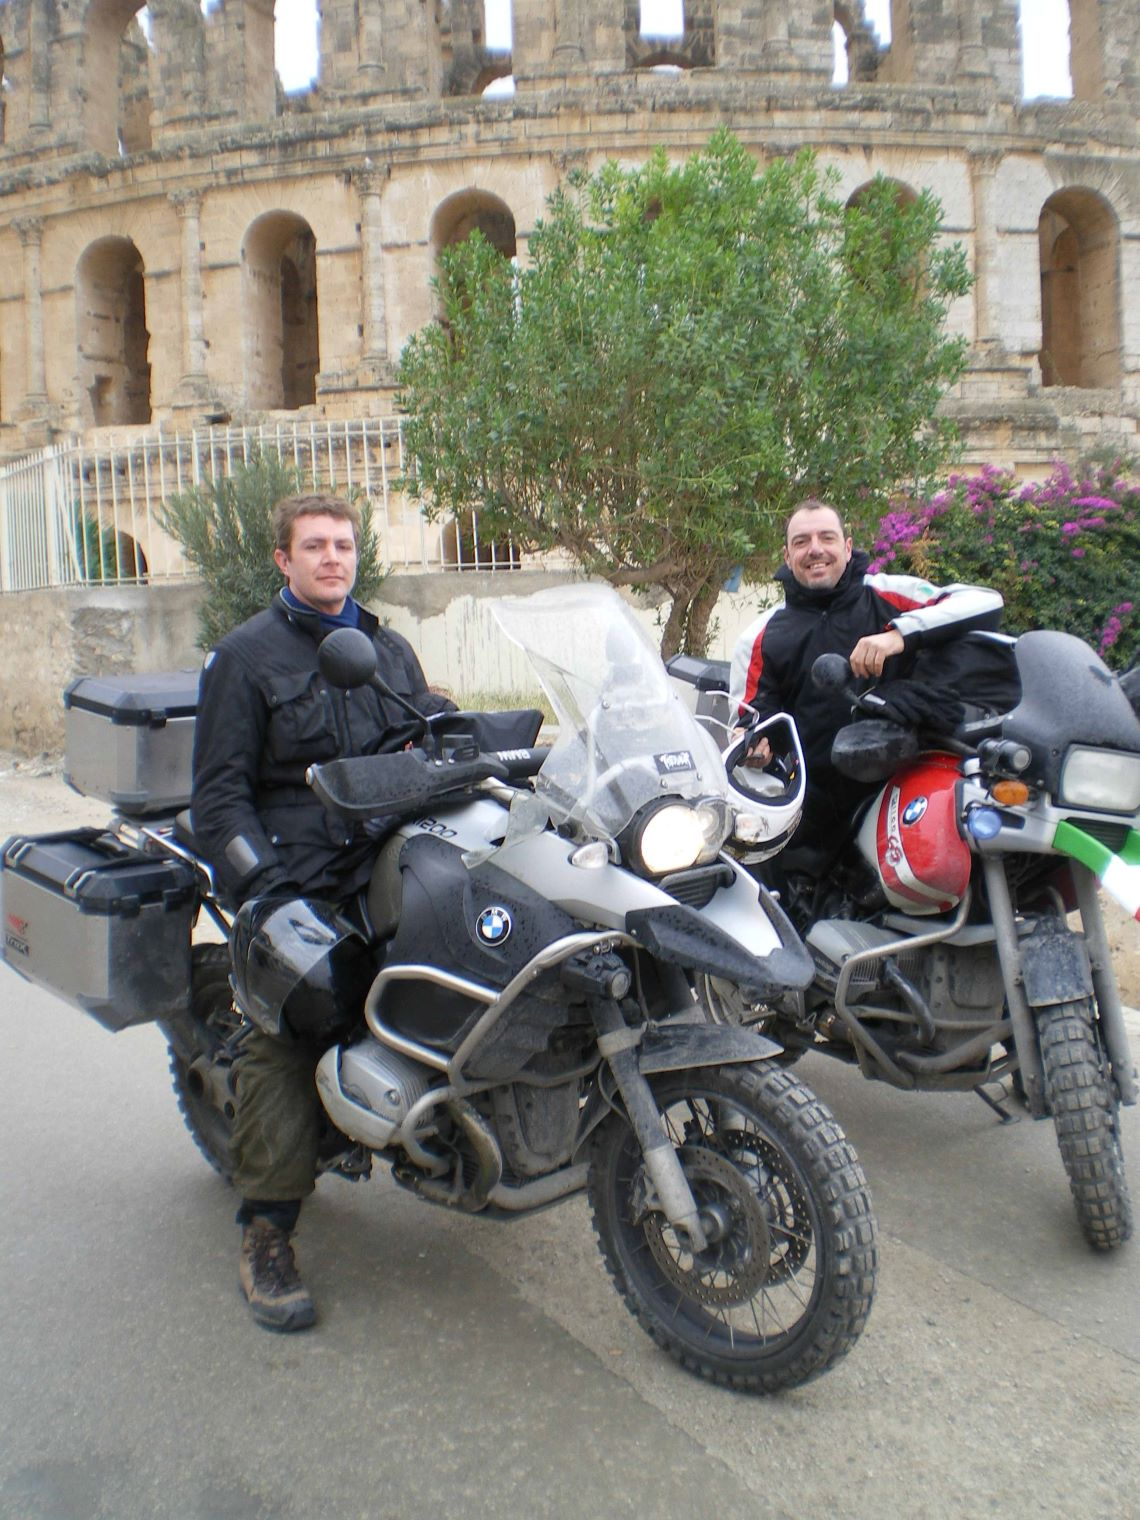 Tunisia-Outside-The-Colosseum